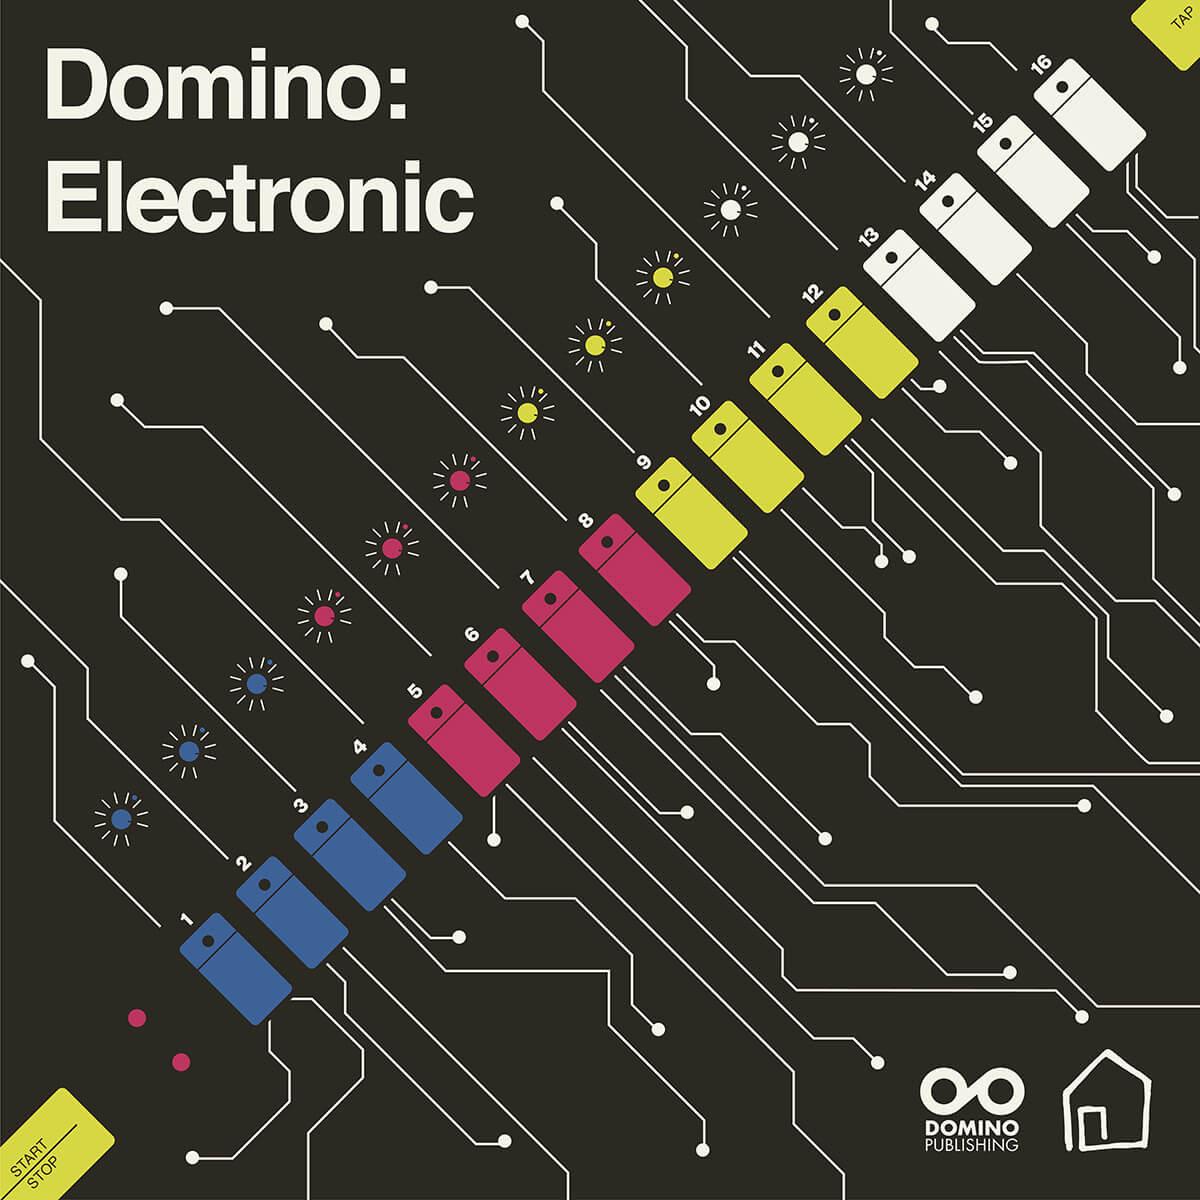 domino-electronic-1